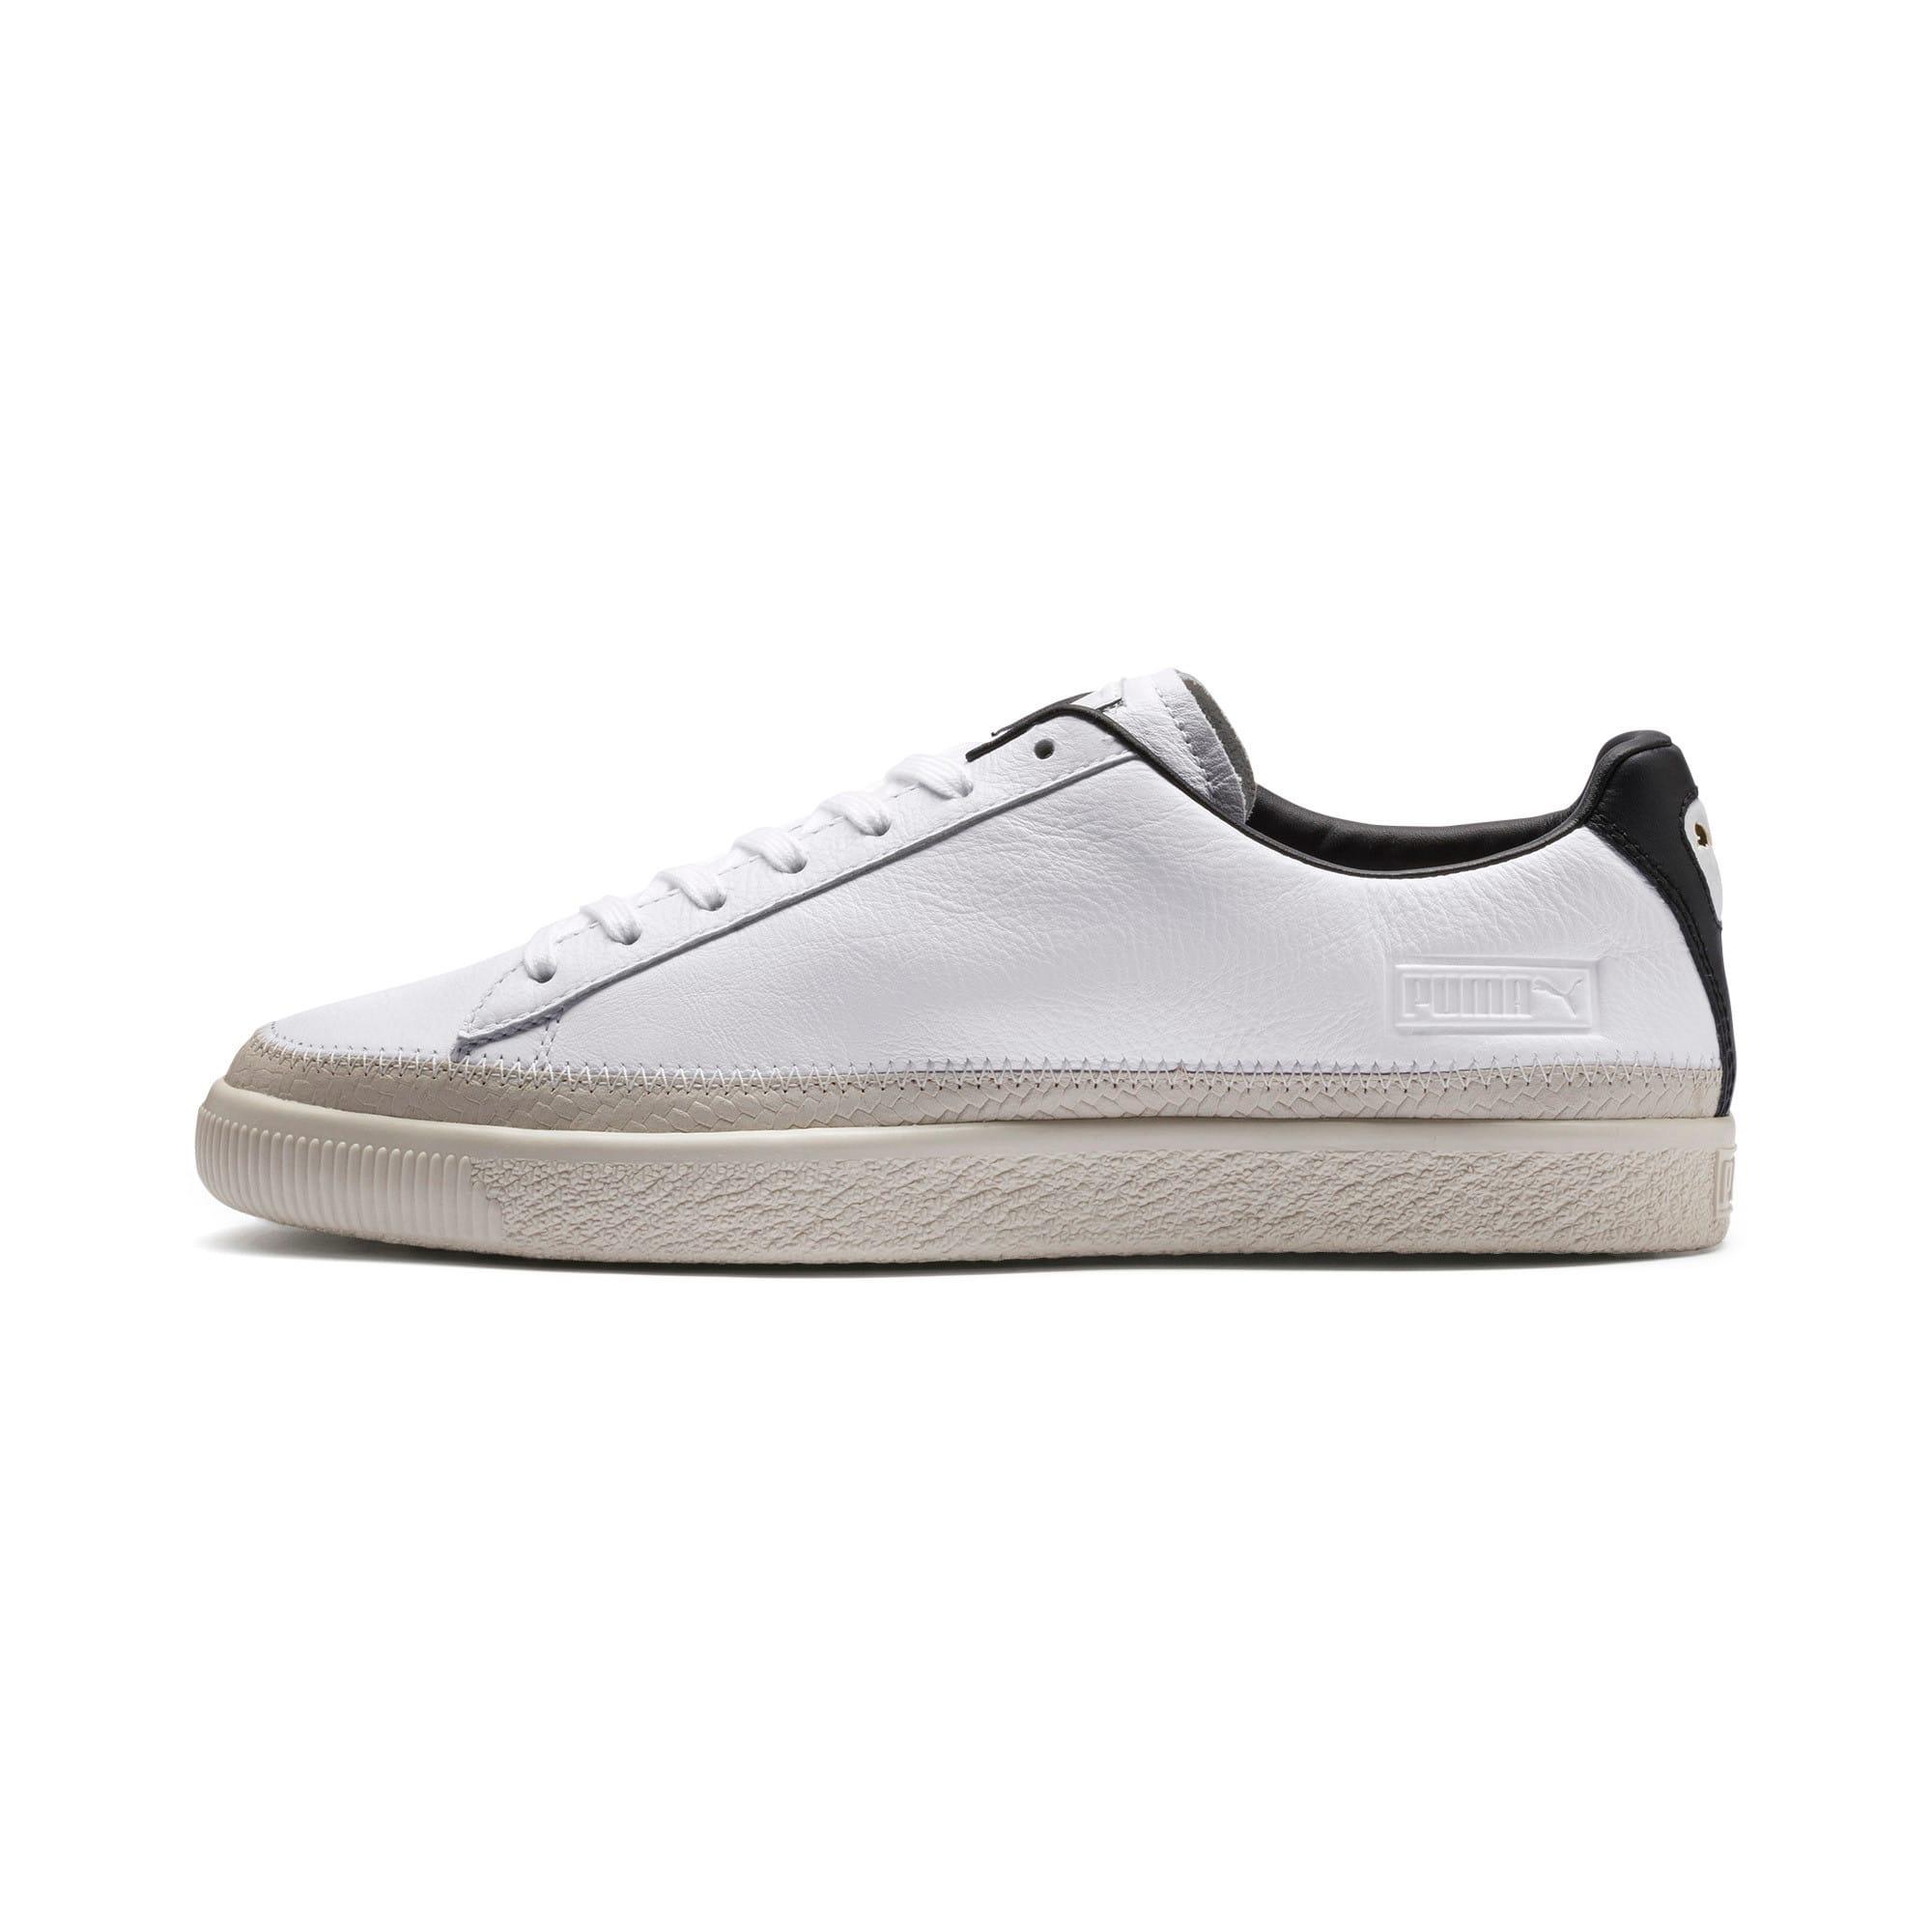 Thumbnail 1 of Basket Trim Shoes, Puma White-Whisper W-Black, medium-IND